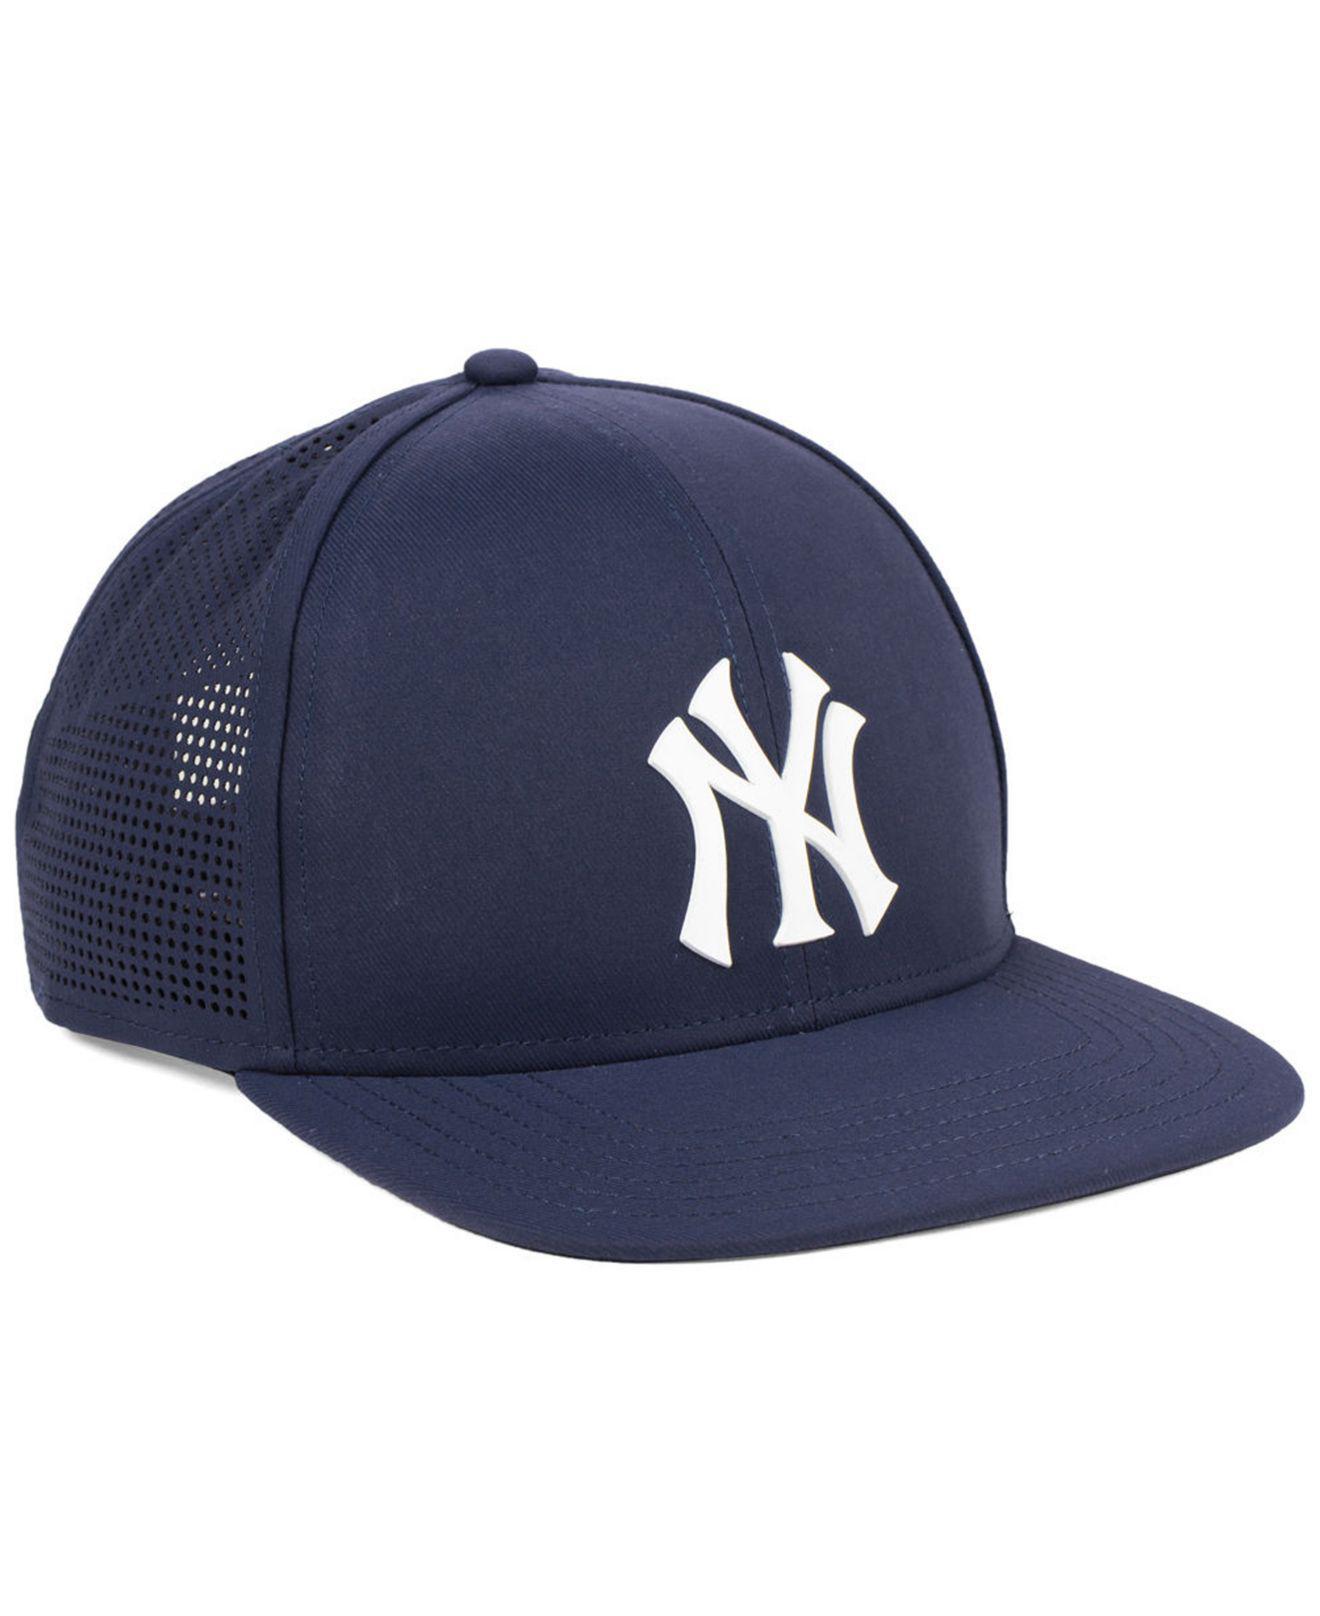 new styles 5c2ac a0c8b ... top quality new york yankees supervent cap for men lyst. view fullscreen  7be89 dfbb7 ...